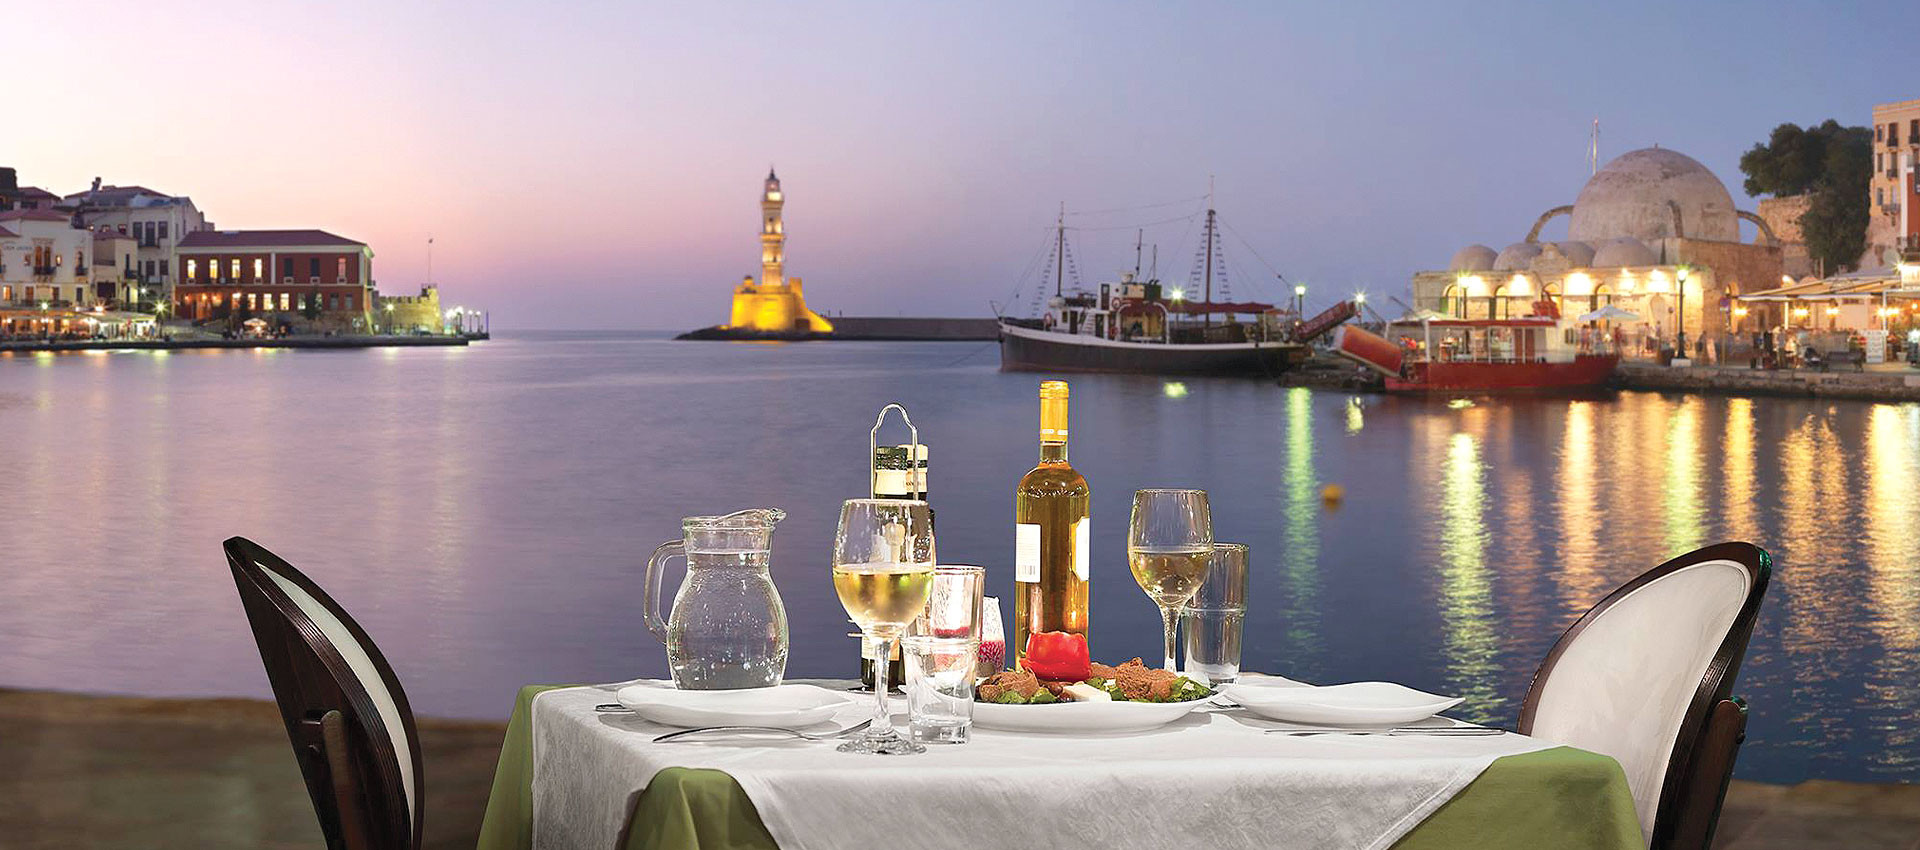 Restaurants in Chania